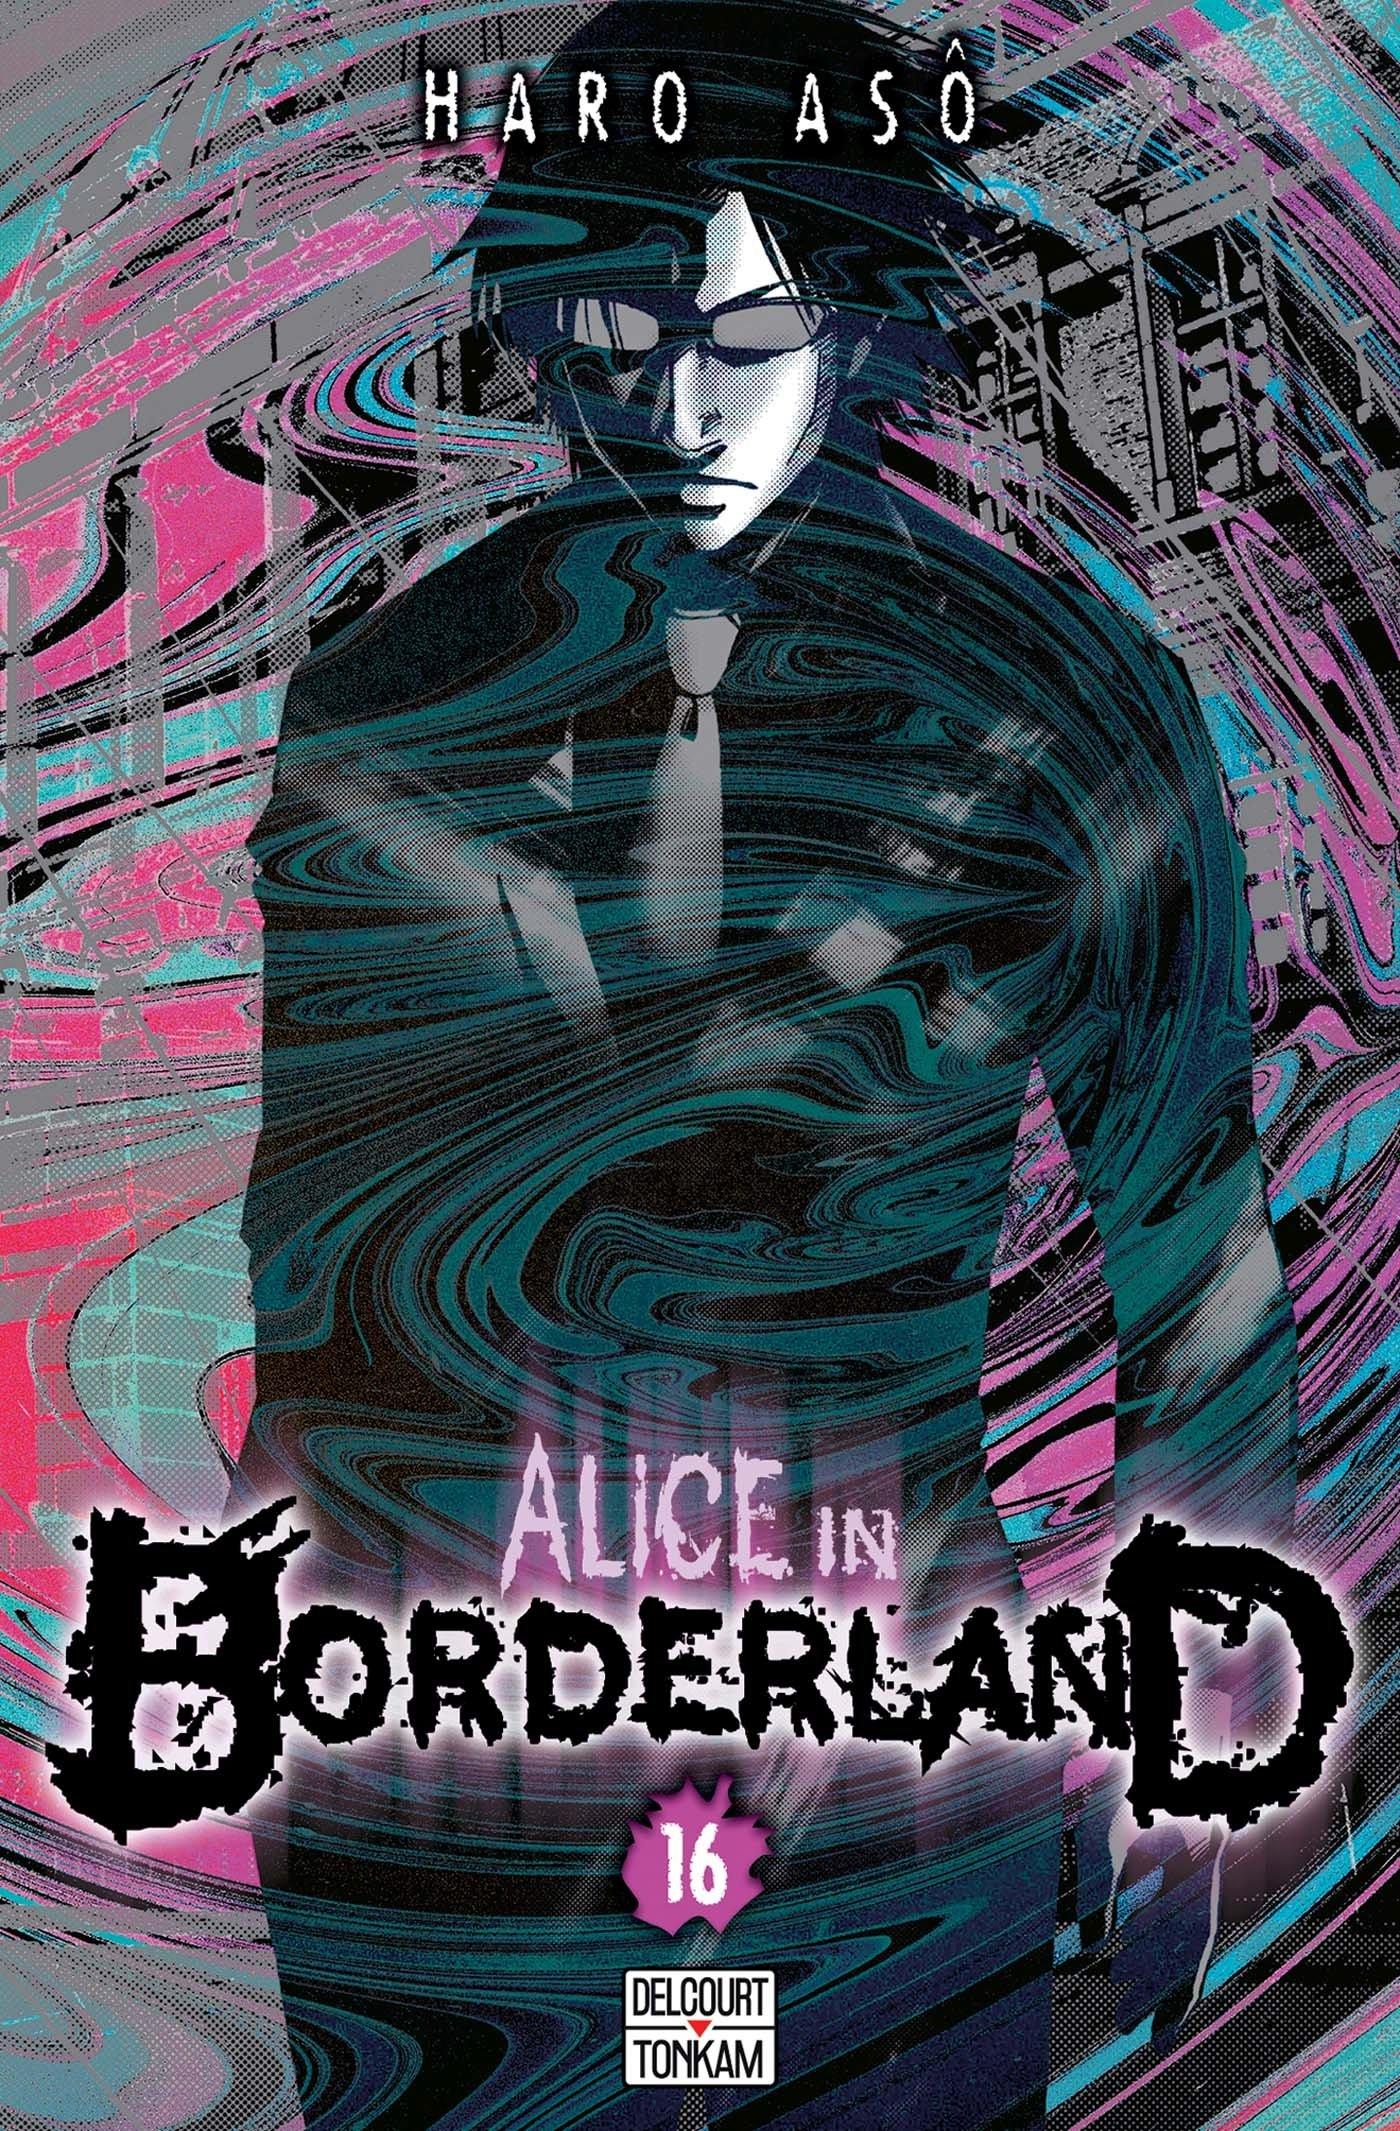 [ MANGA / OAV ] Alice in Borderland Alice-in-borderland-manga-volume-16-simple-267375